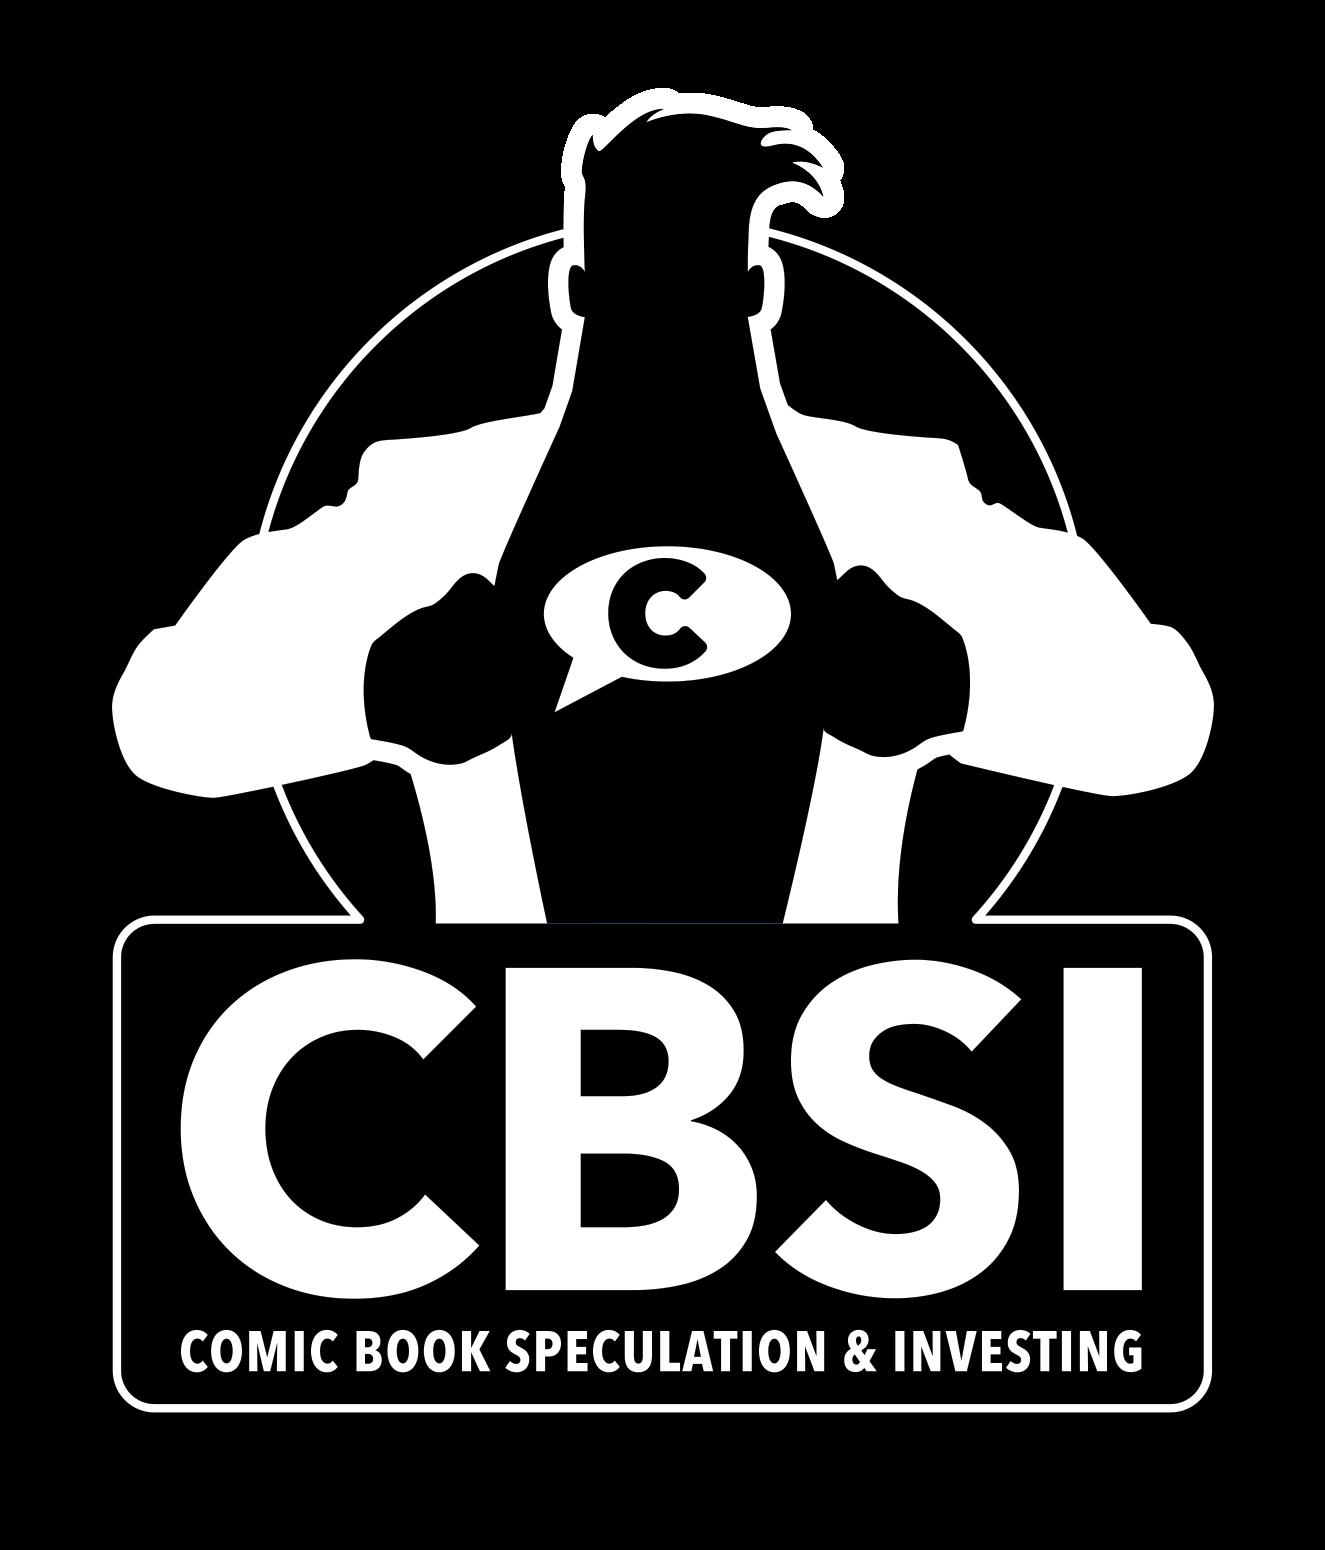 Harley Quinn Cbsi Comics